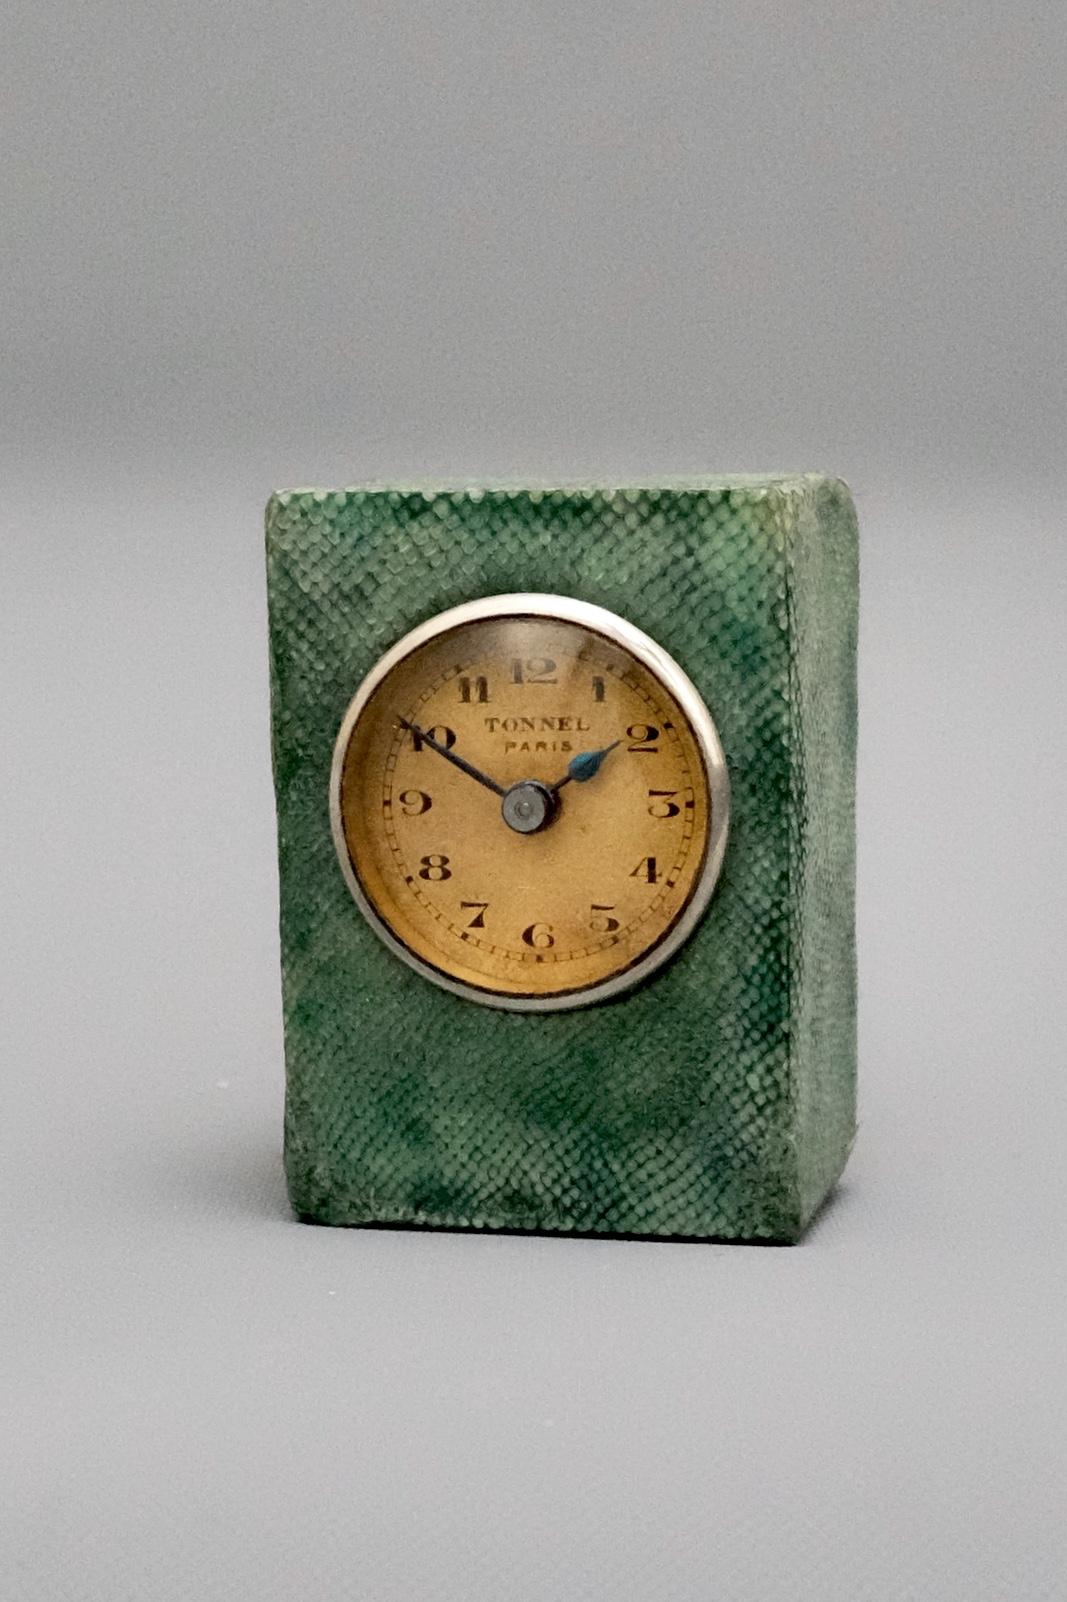 Green snakeskin miniature carriage clock